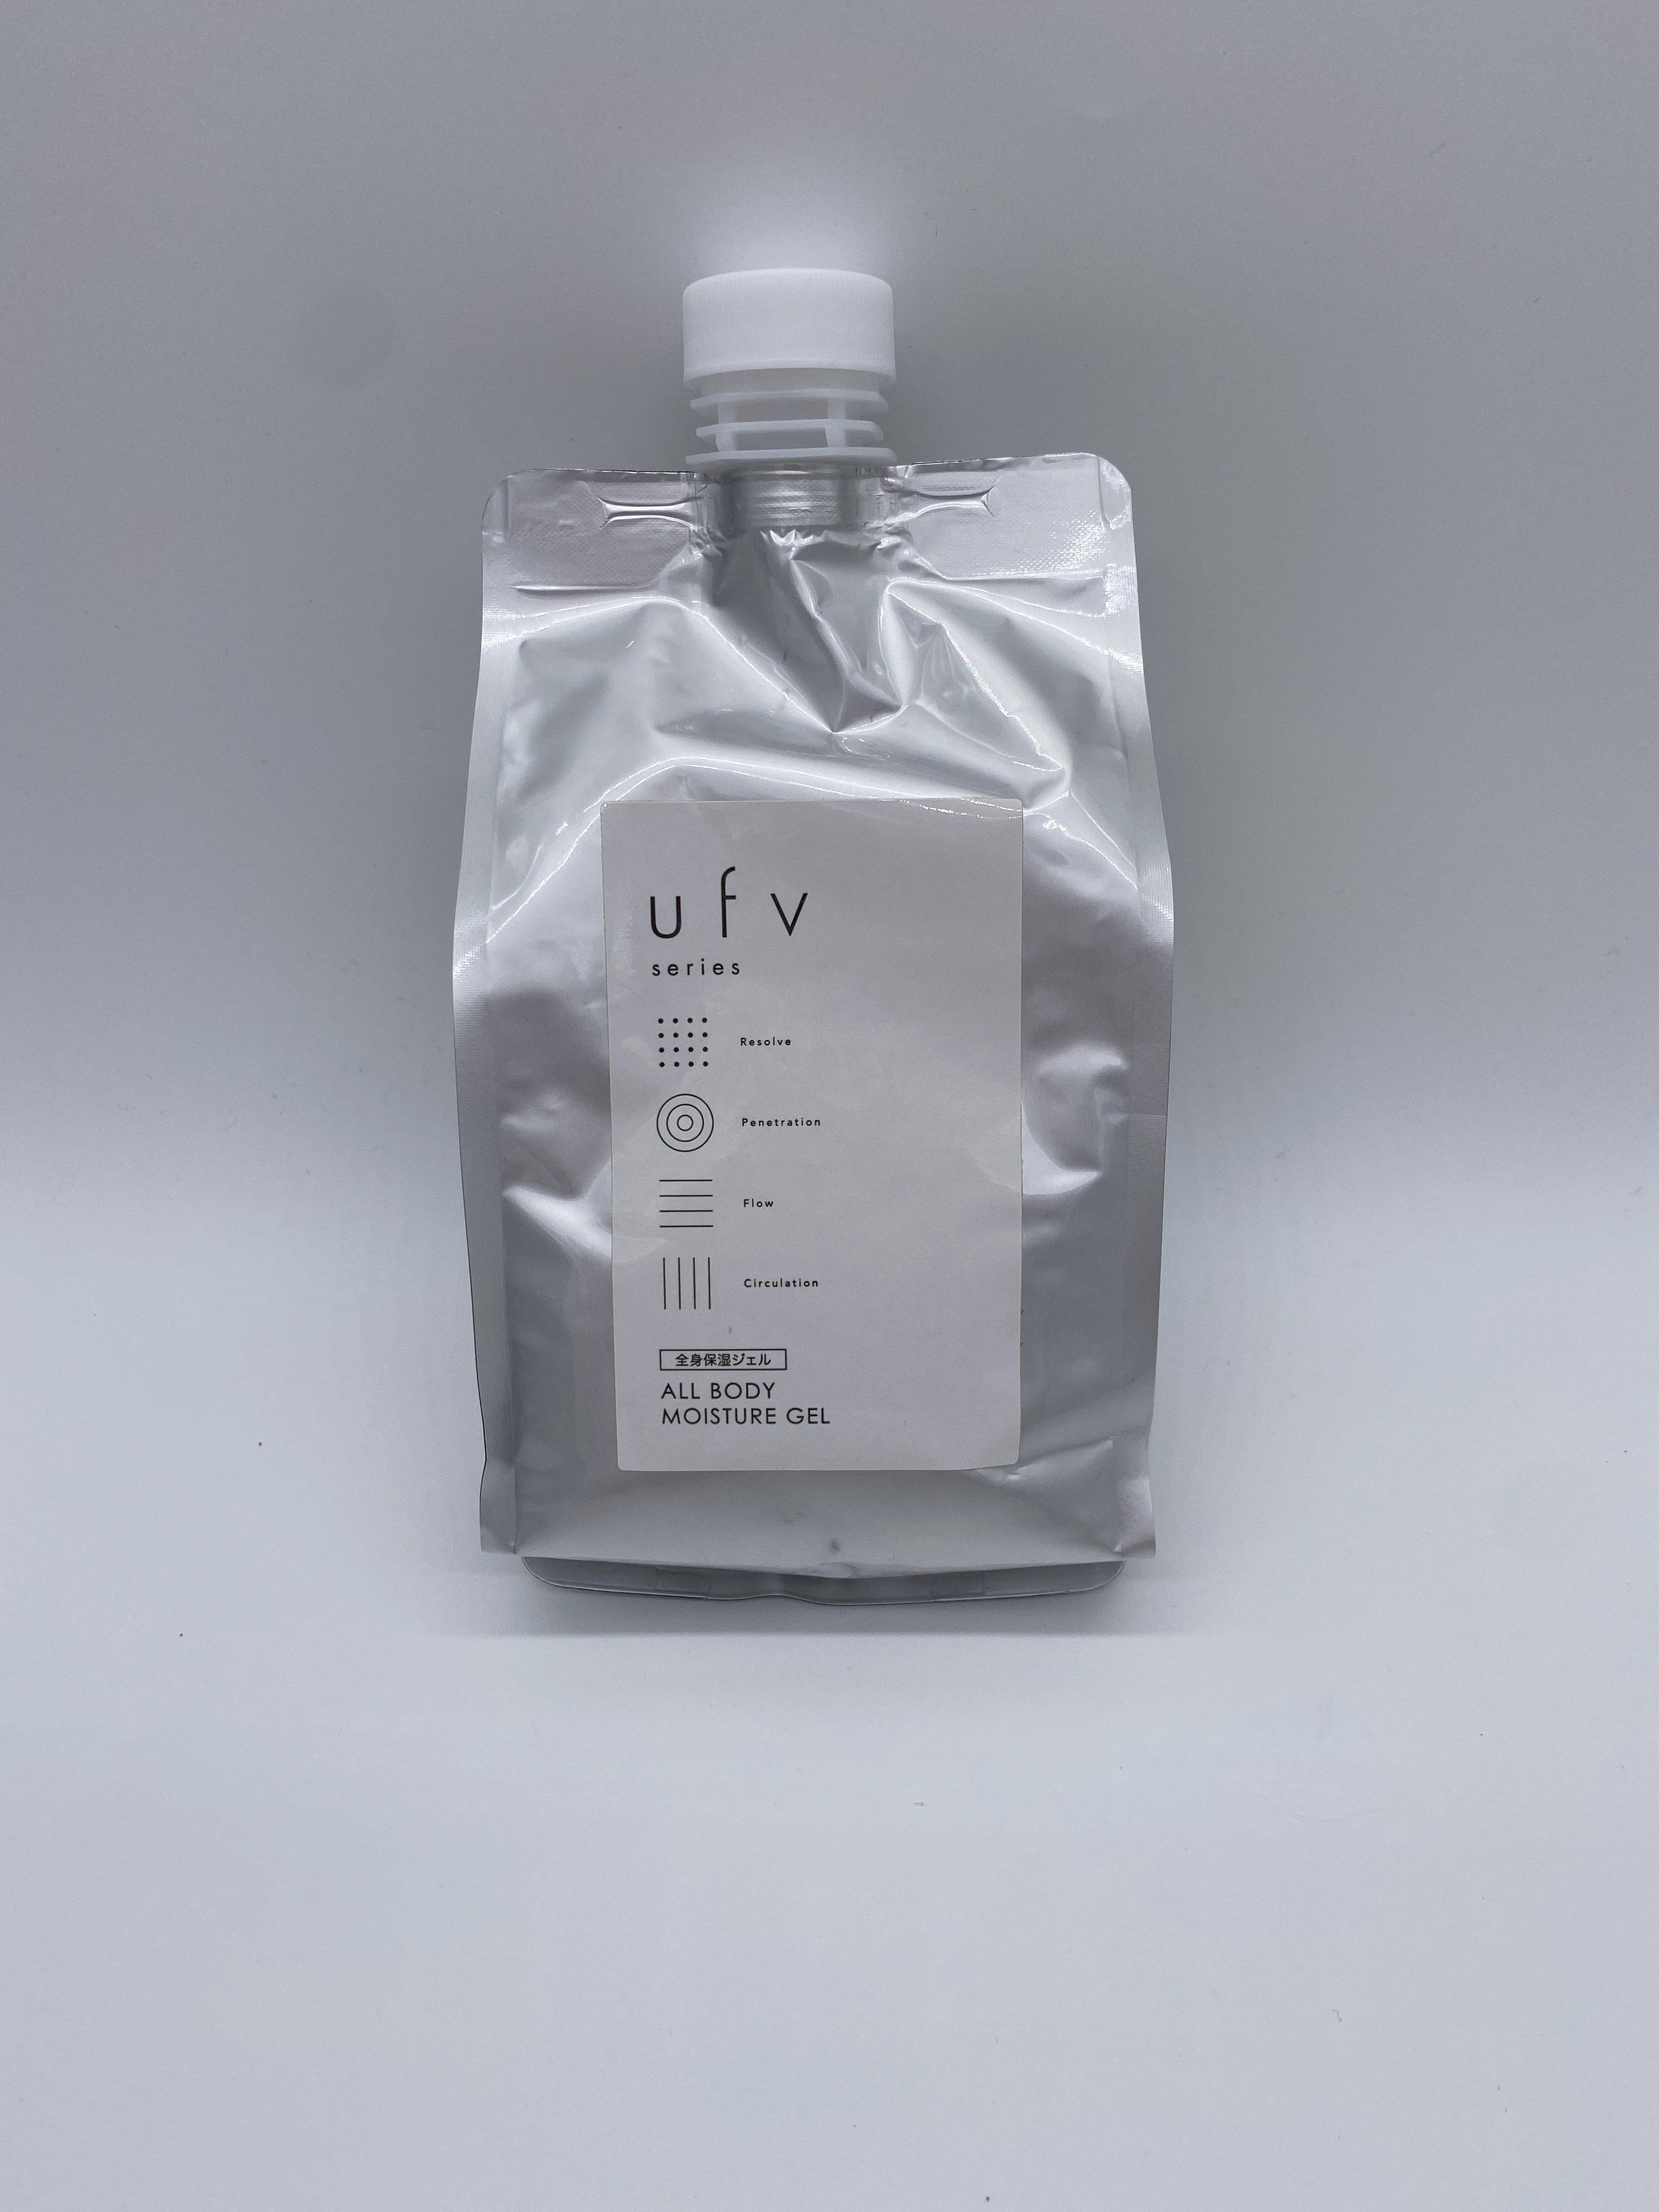 「ufvオールボディモイスチャージェル1kg」ポンプ付き購入ウェブチケットのイメージその2